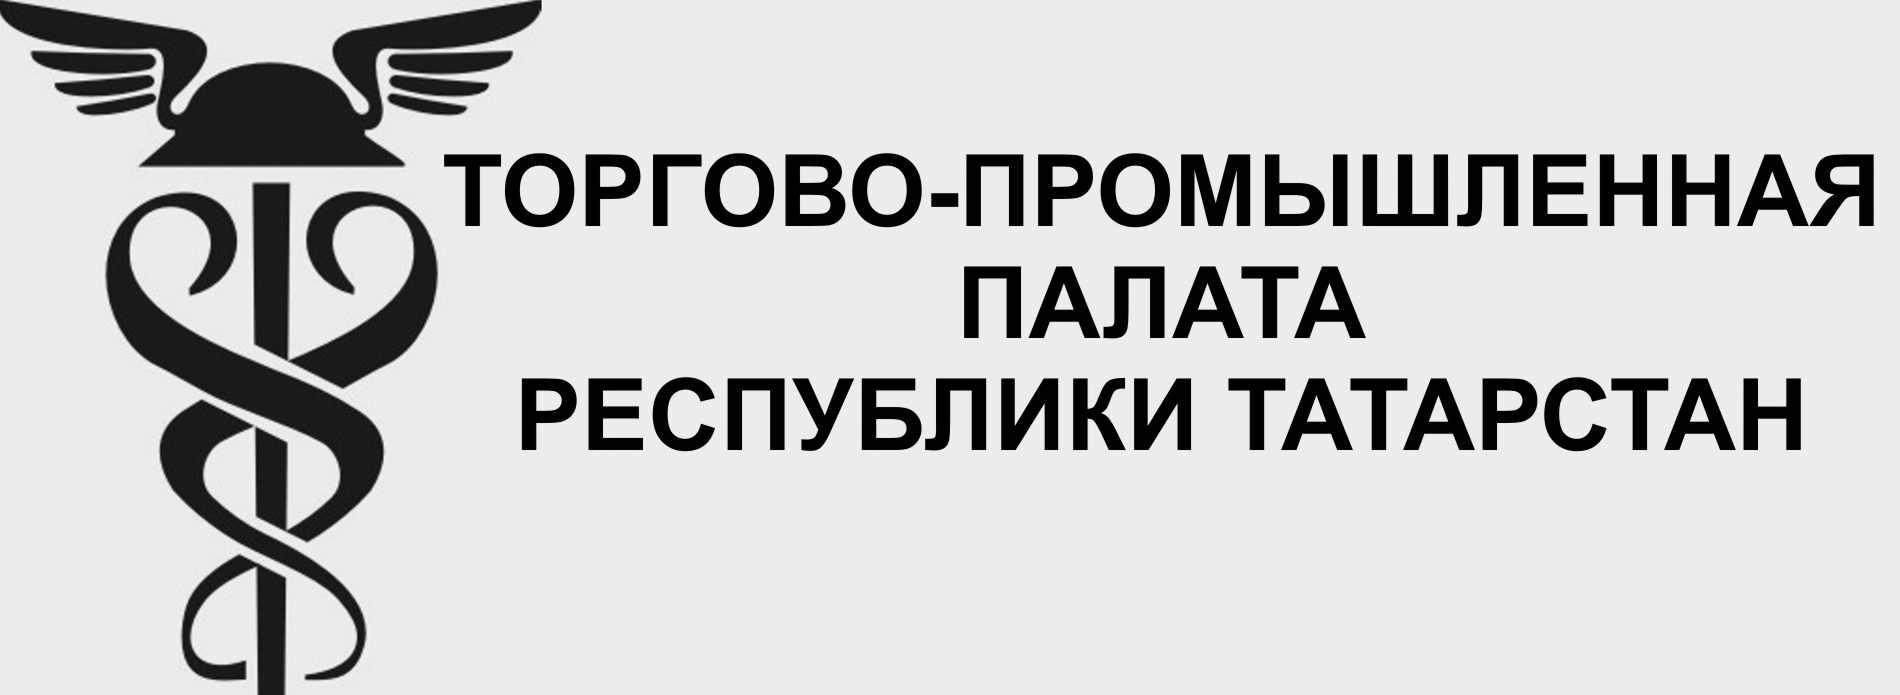 ТПП РТ